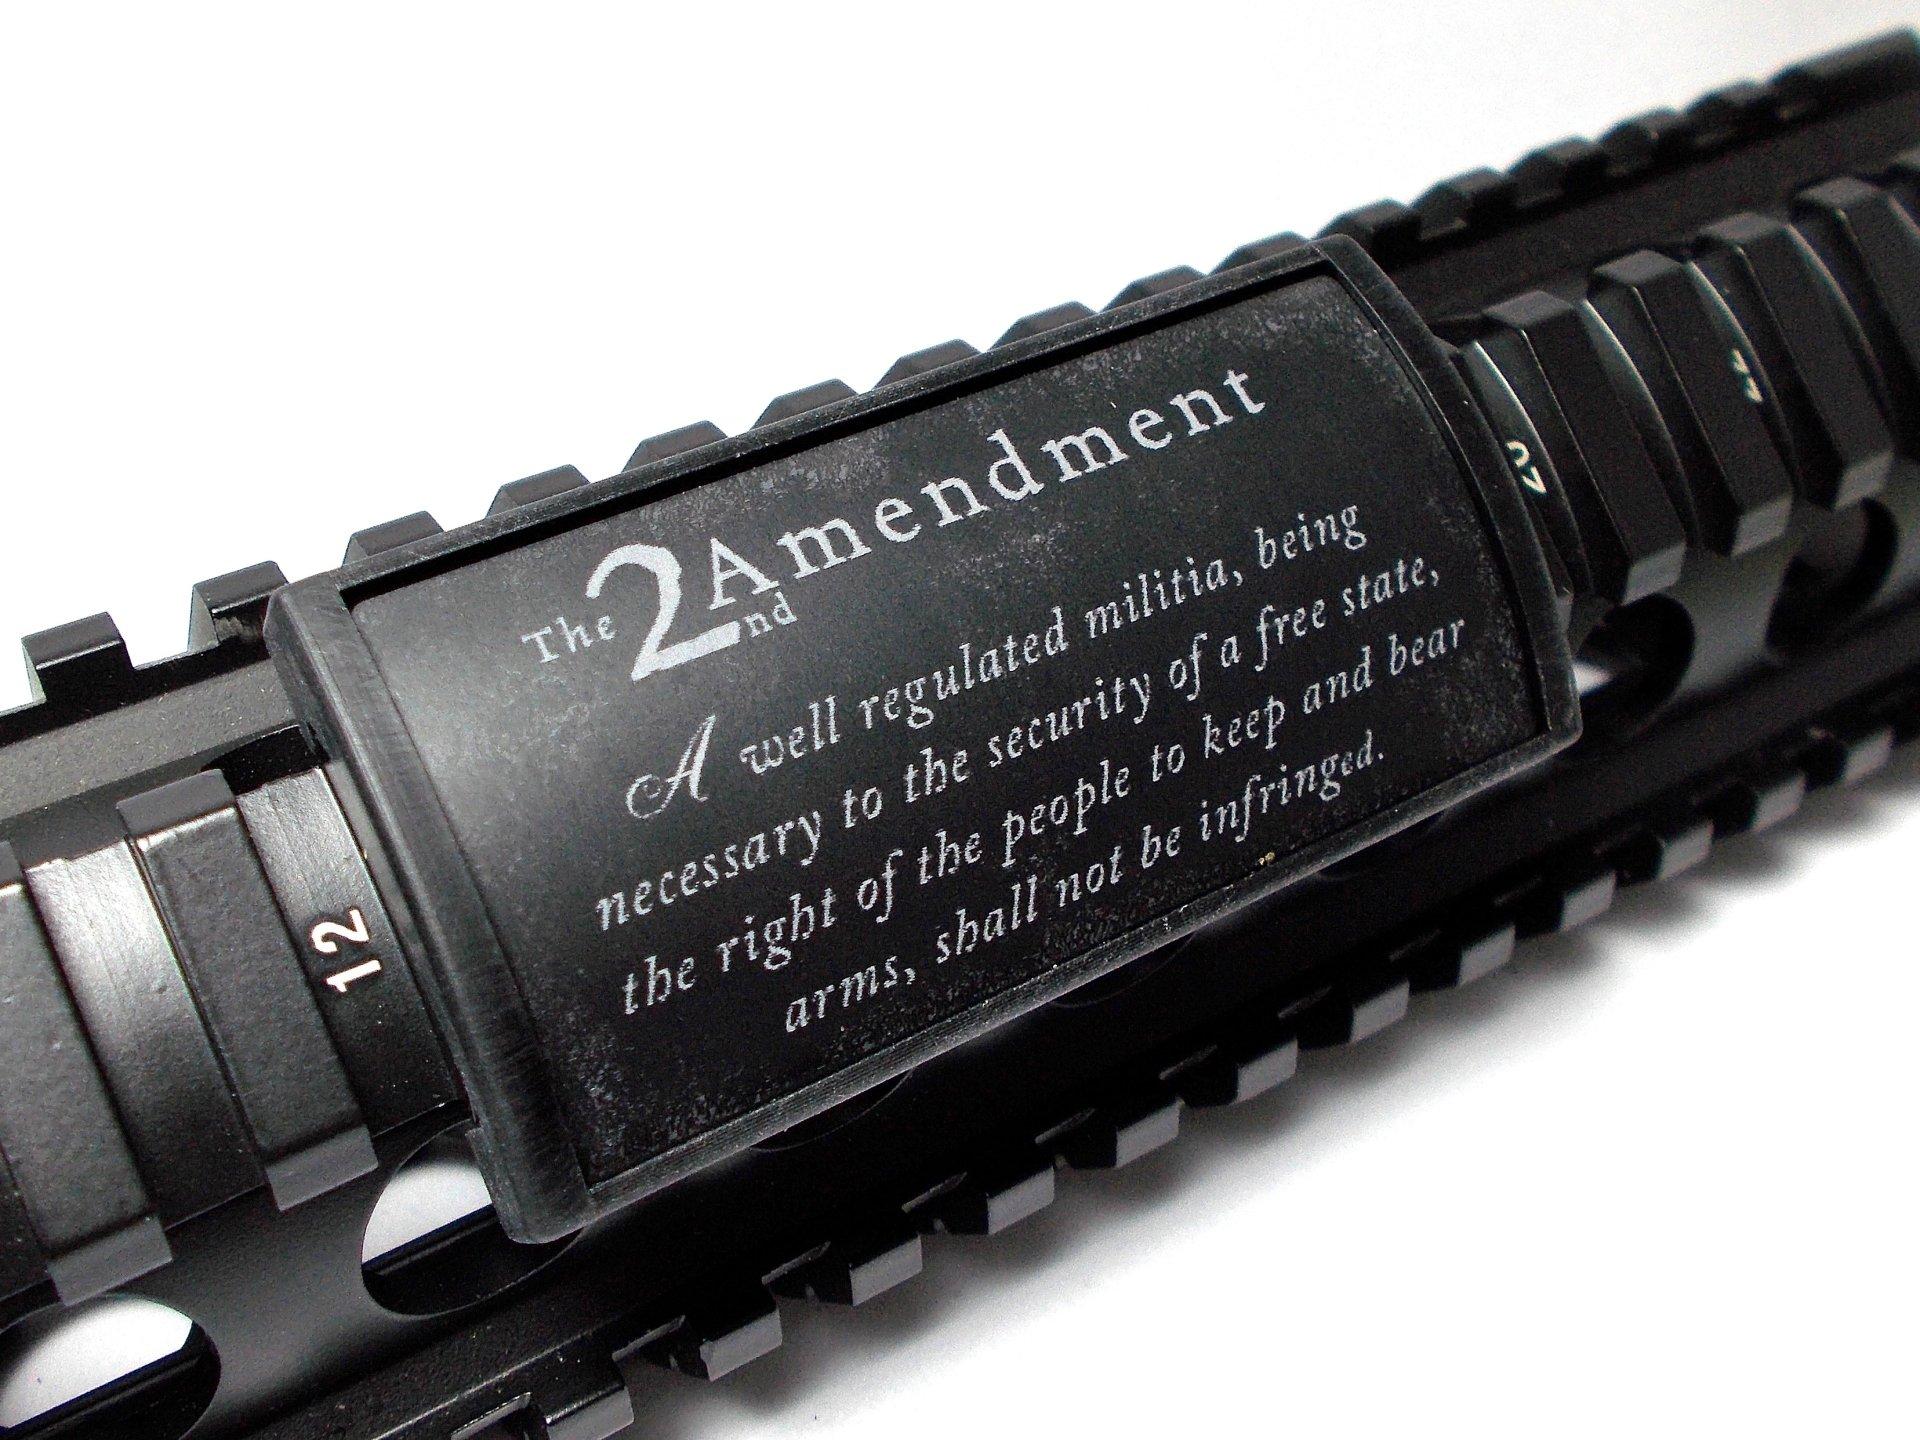 2nd Amendment Hd Wallpaper Background Image 3311x2483